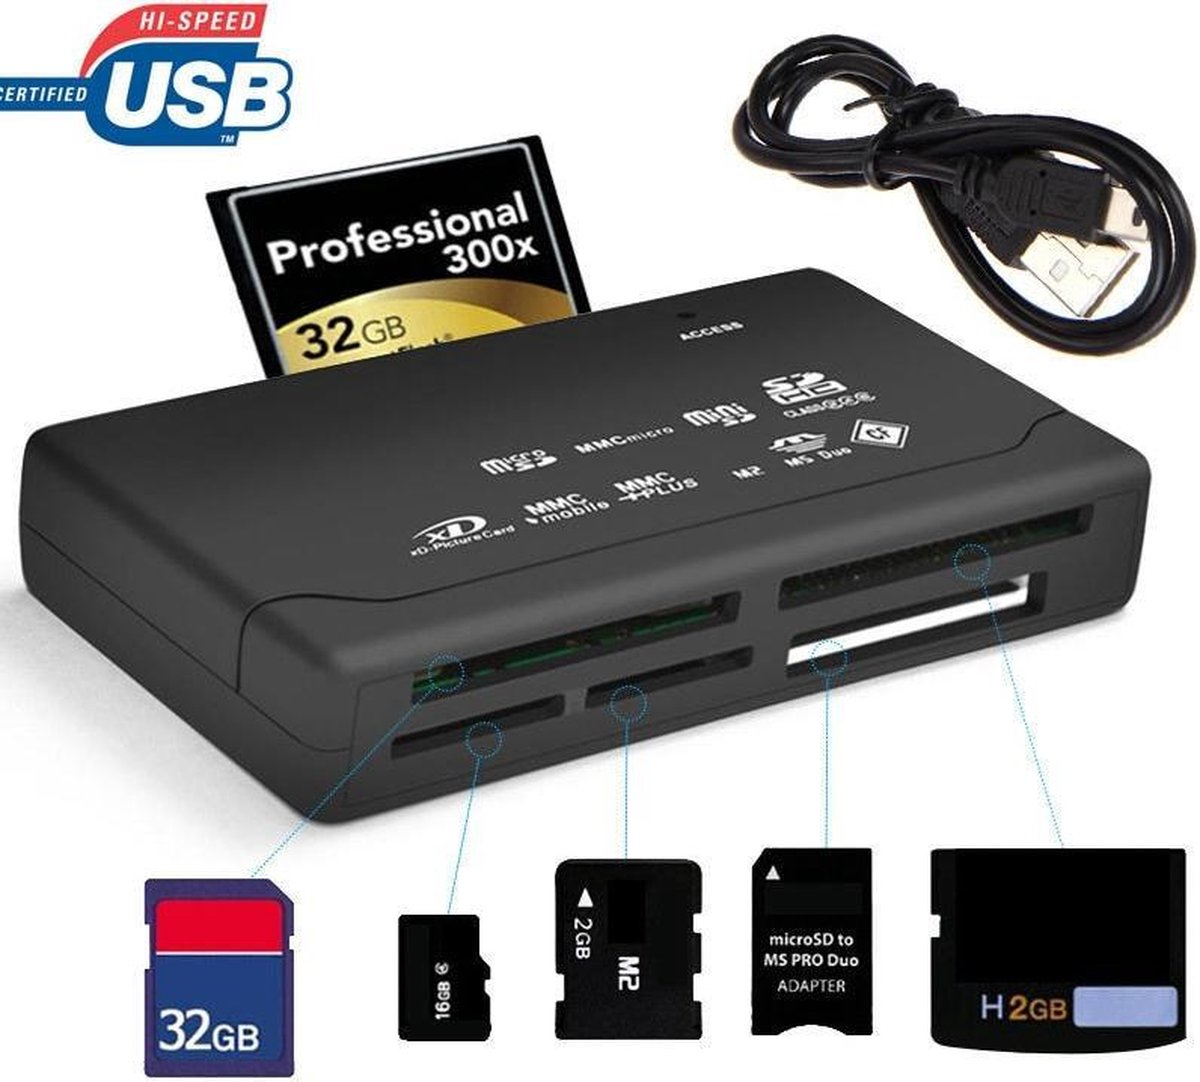 Goodlux Geheugenkaartlezer - All in one kaartlezer - Memorycard reader - CF/TF/MS/M2 - (Micro) SD ka